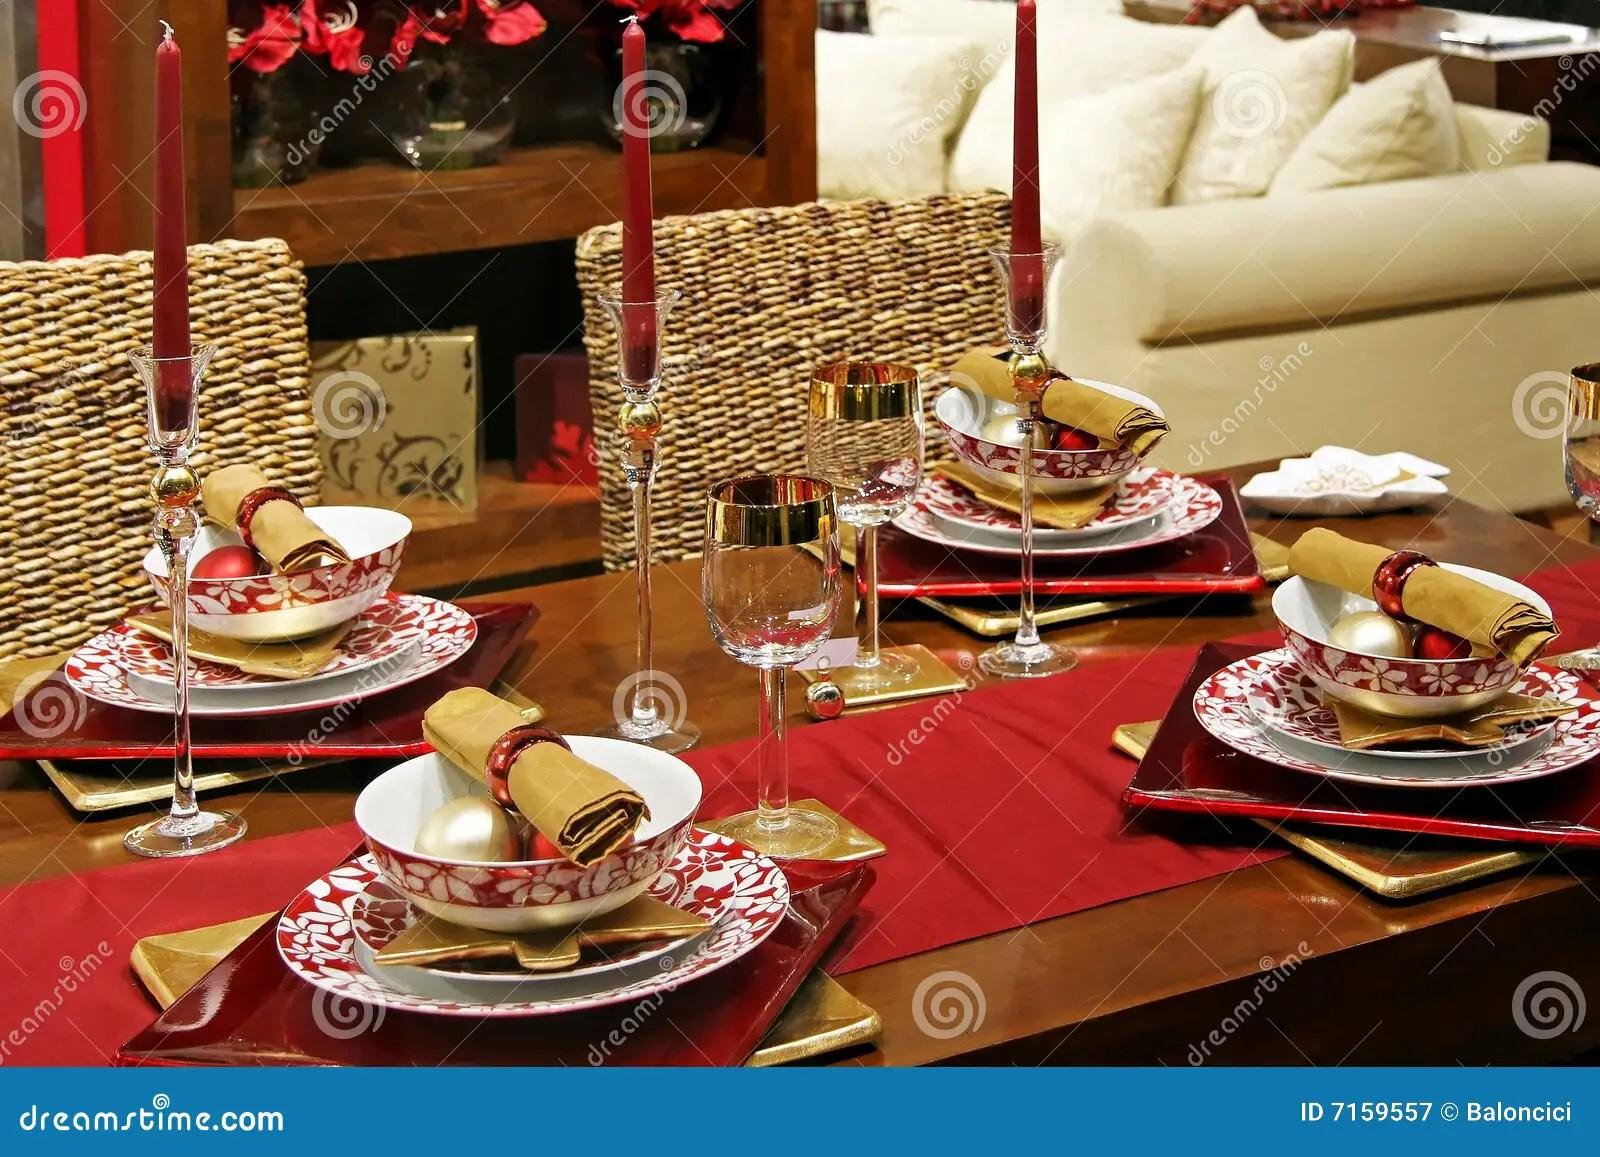 Christmas Table Royalty Free Stock Photography Image